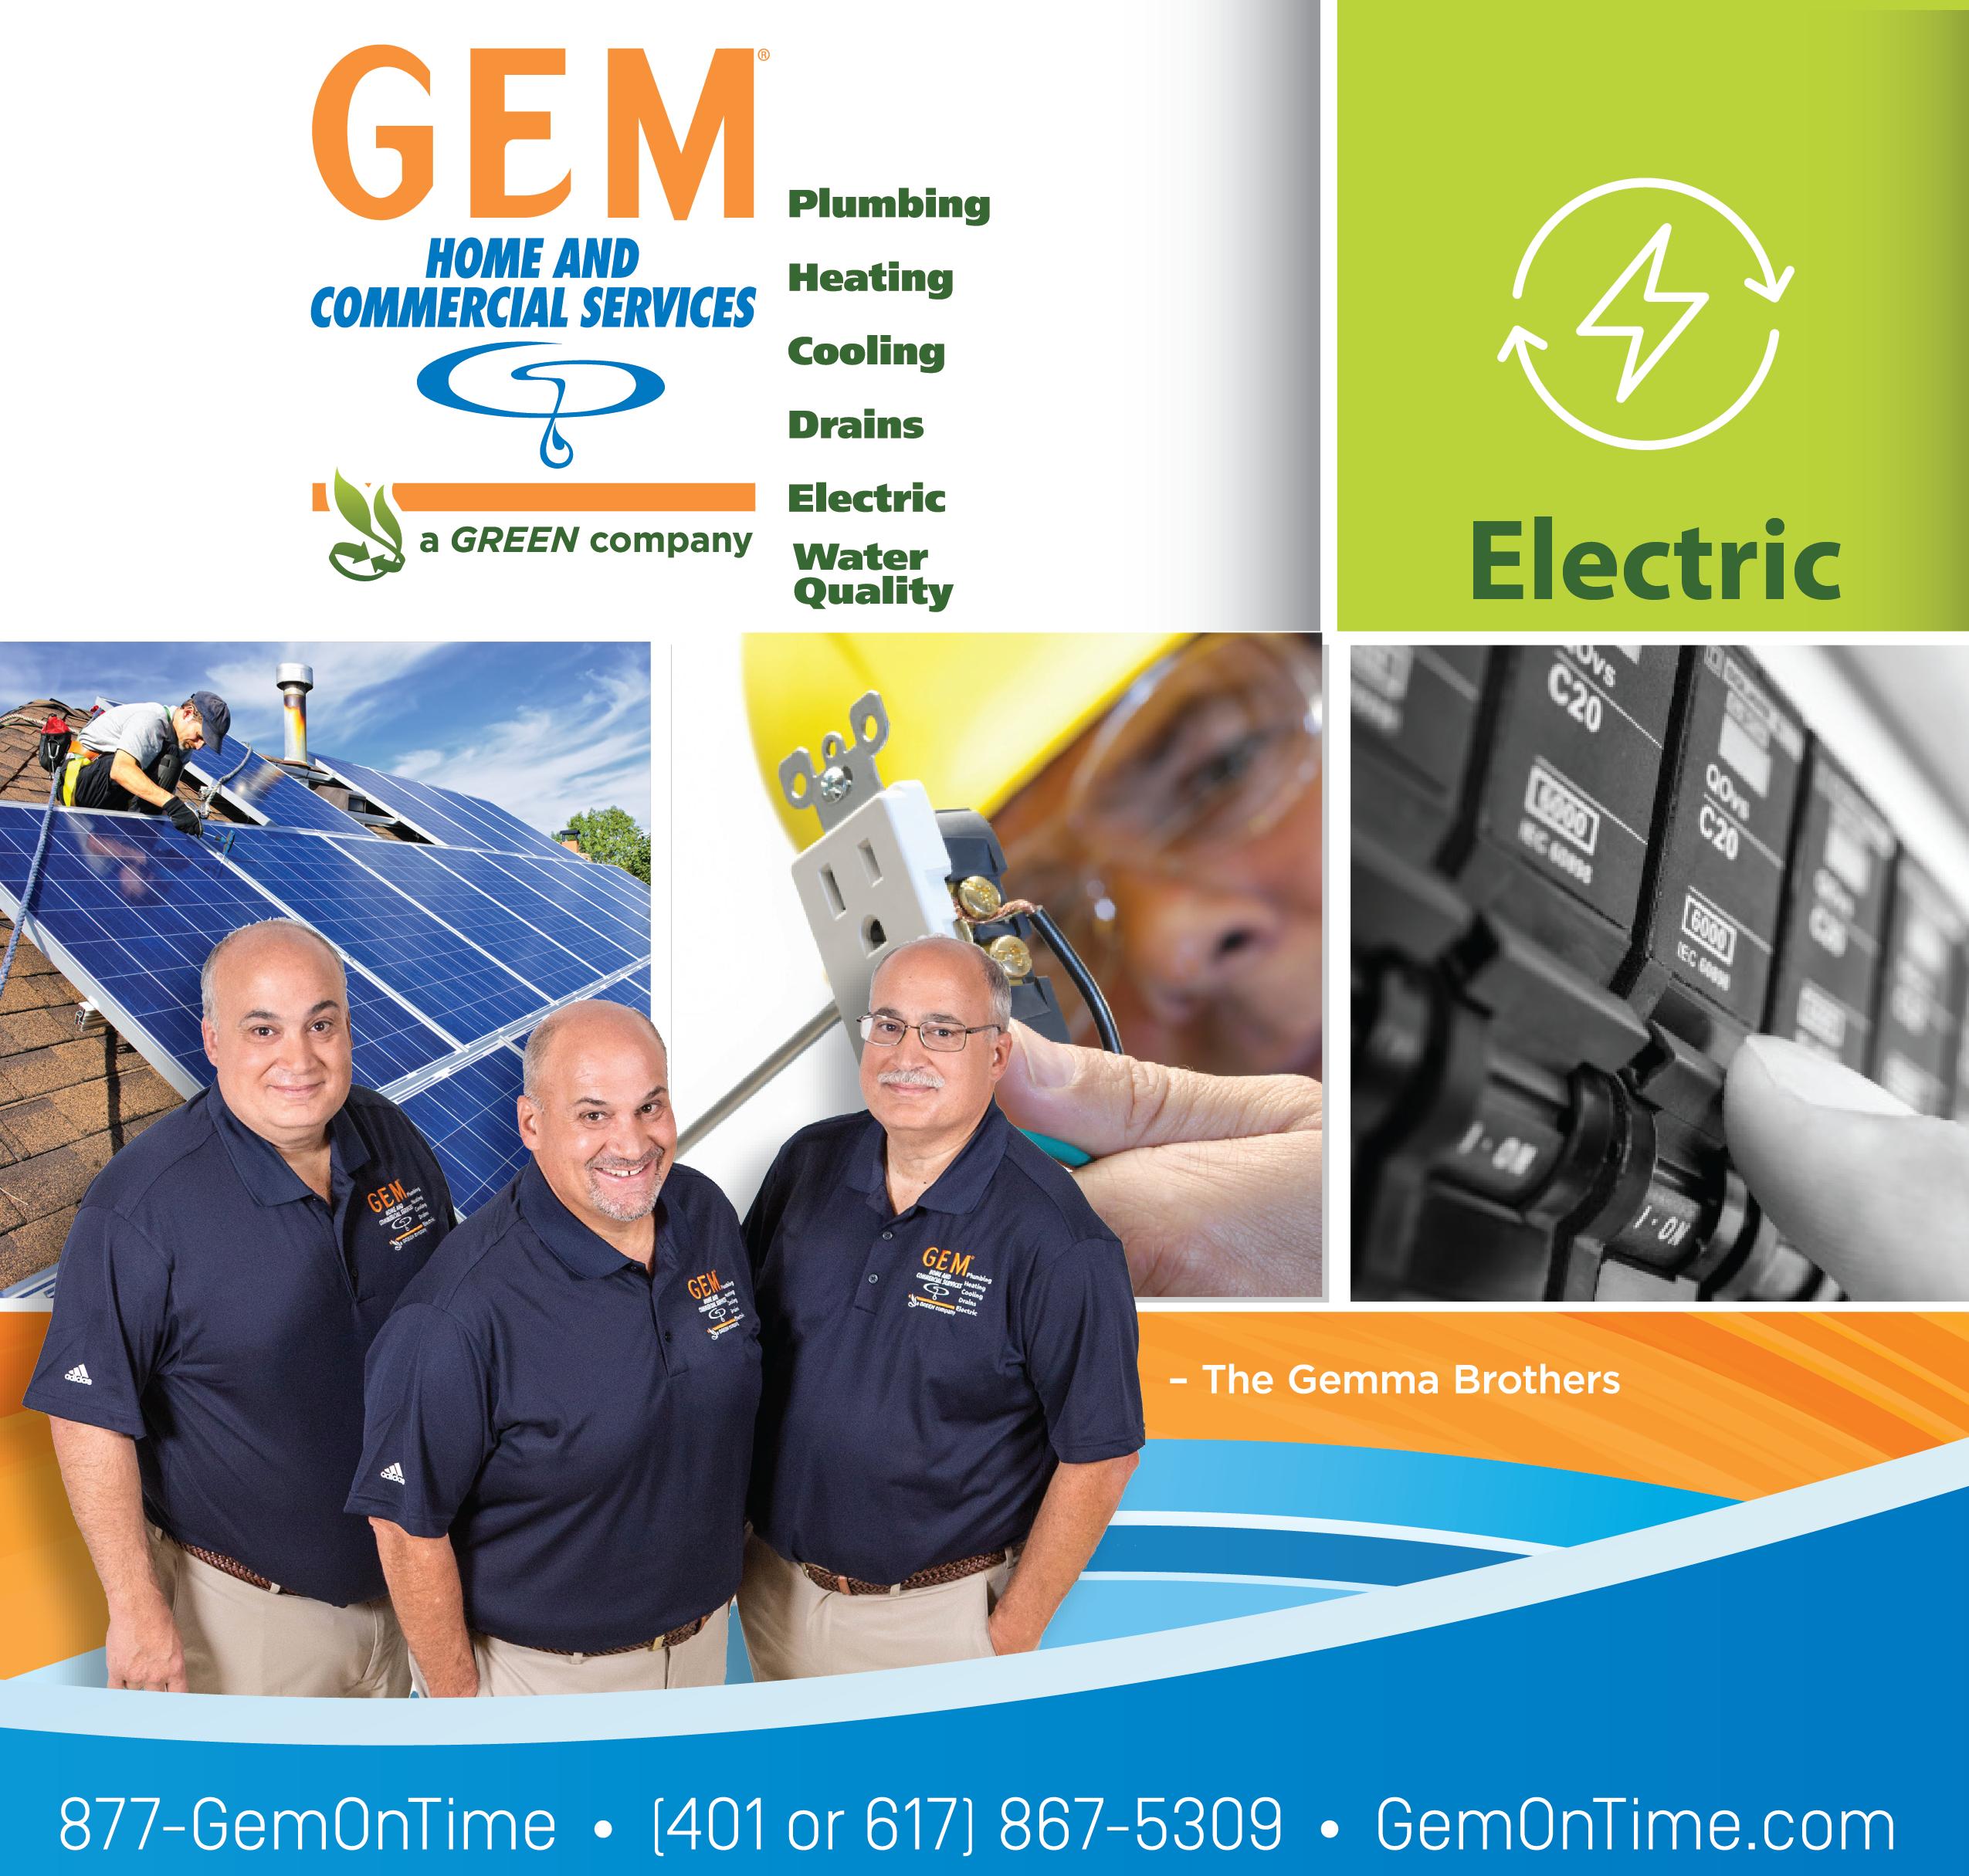 Gem Plumbing & Heating Services, Inc. image 4